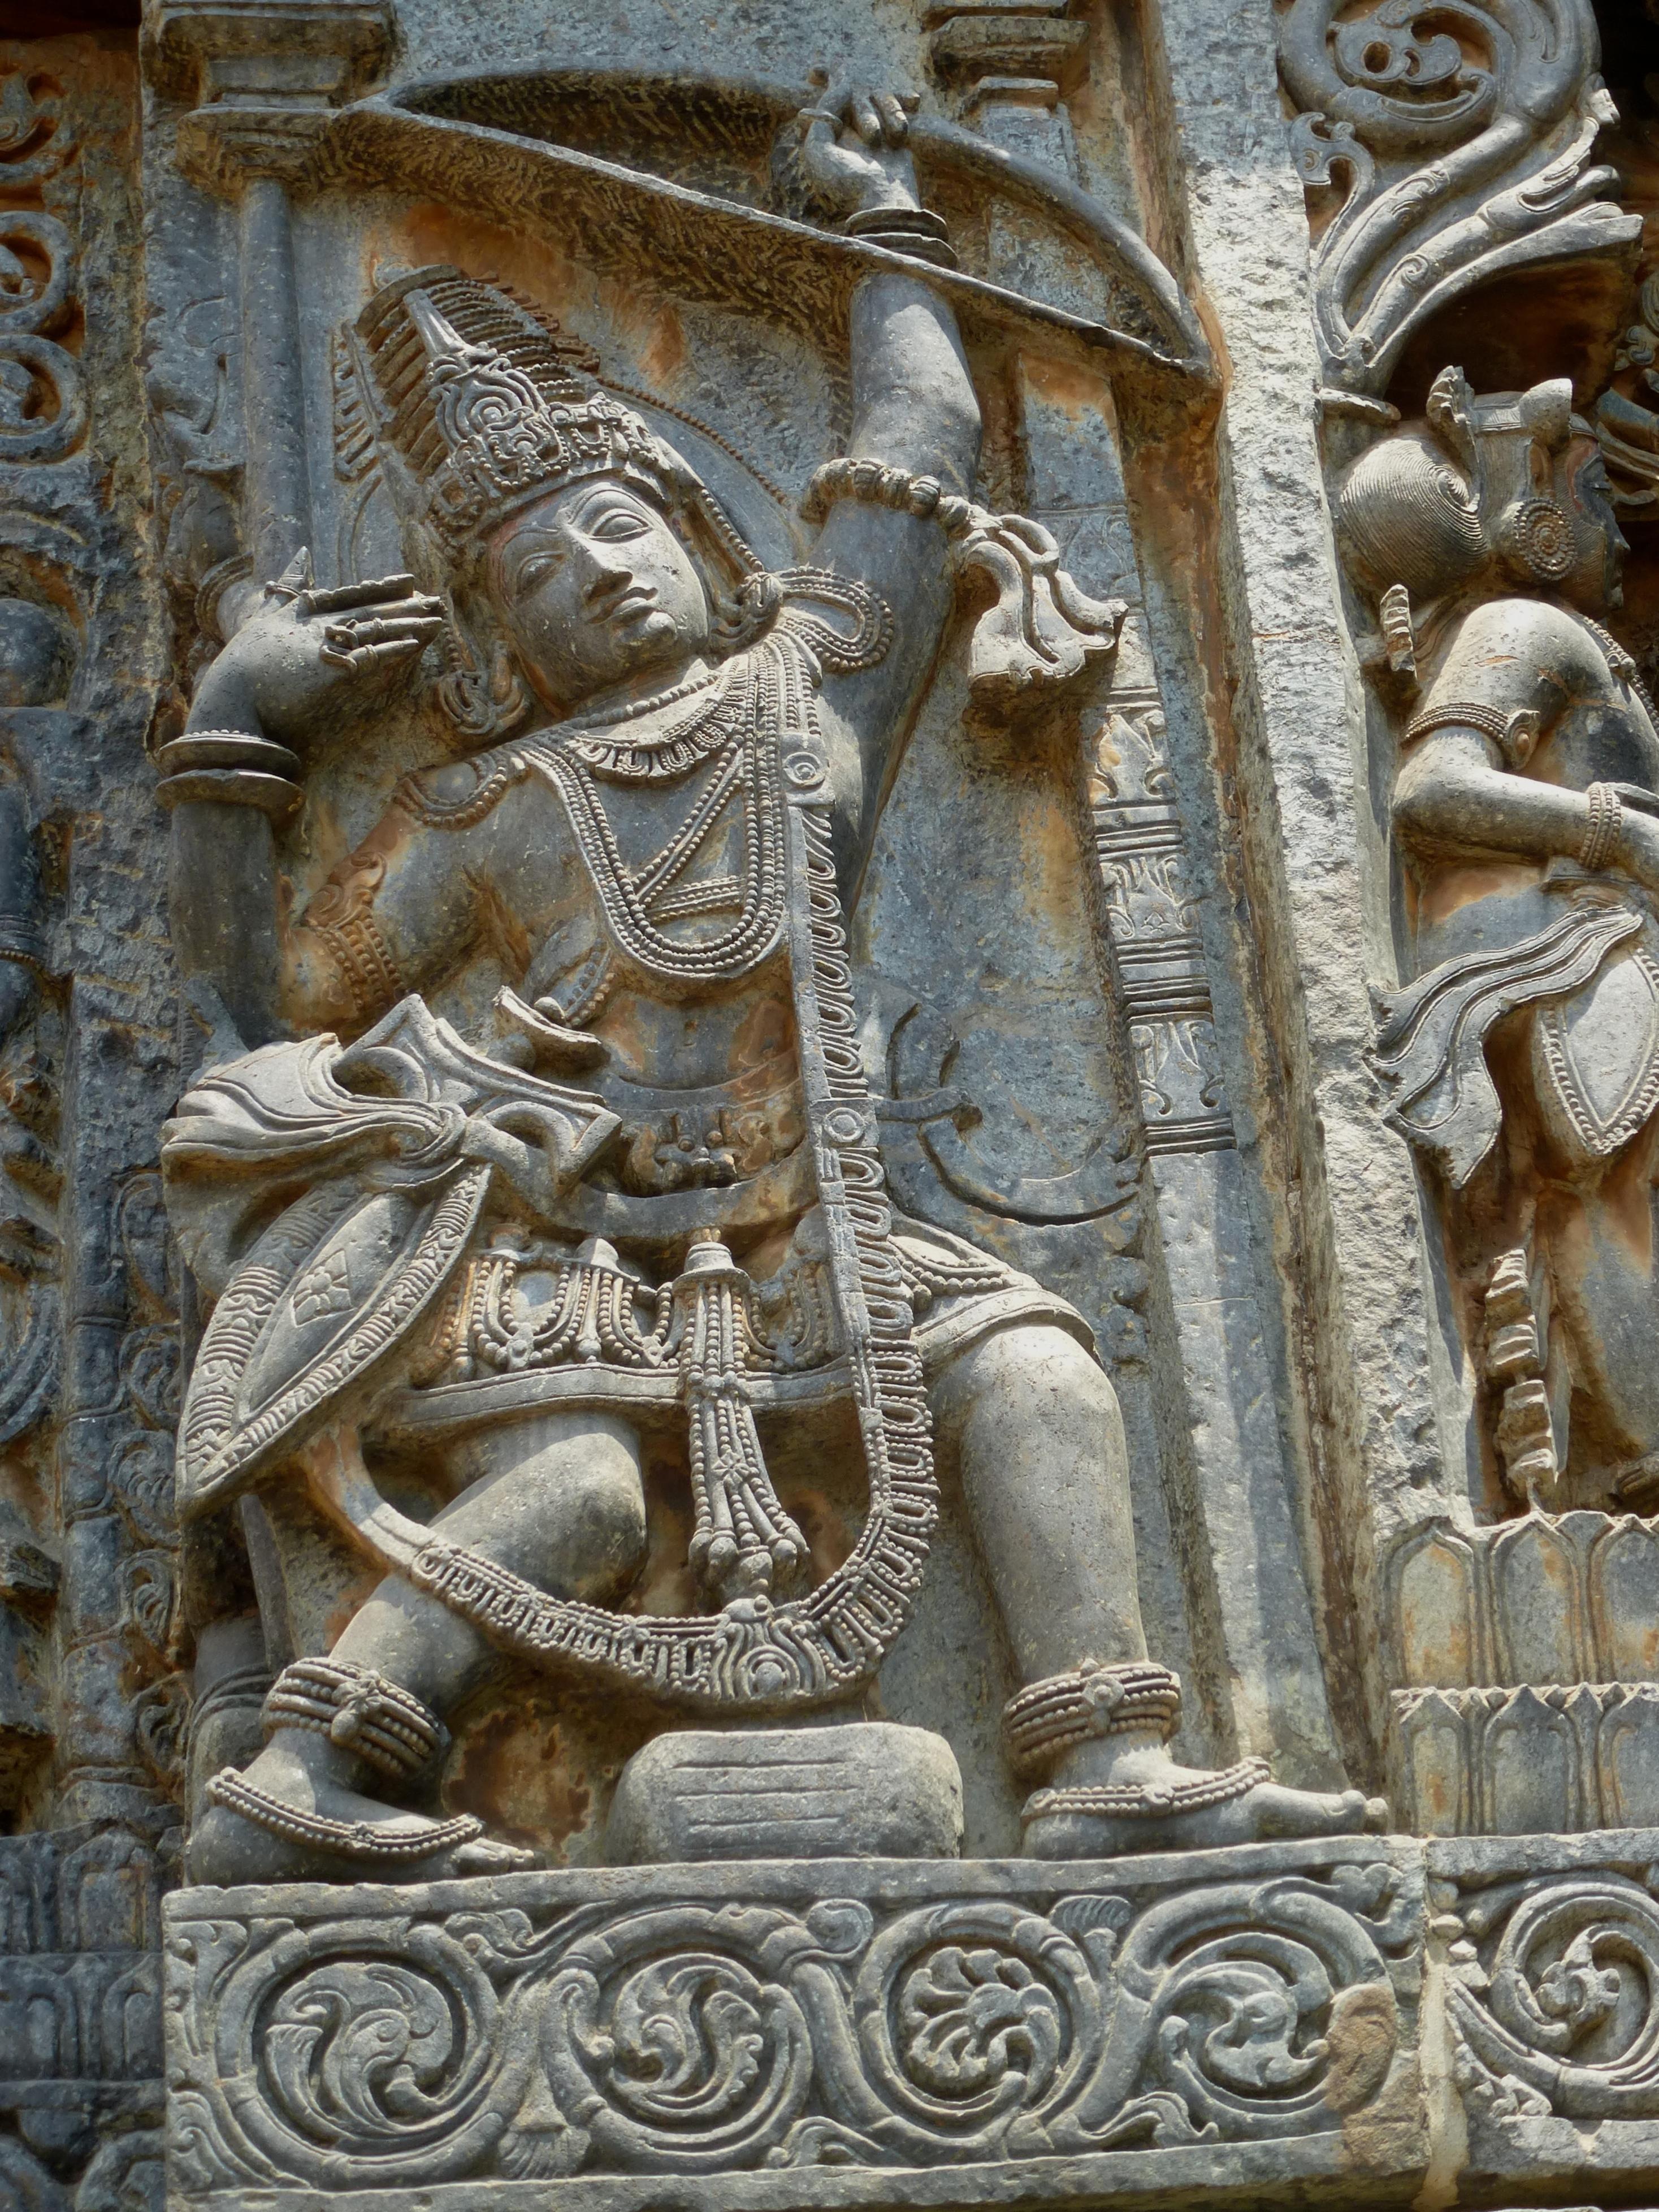 Arjuna the archer